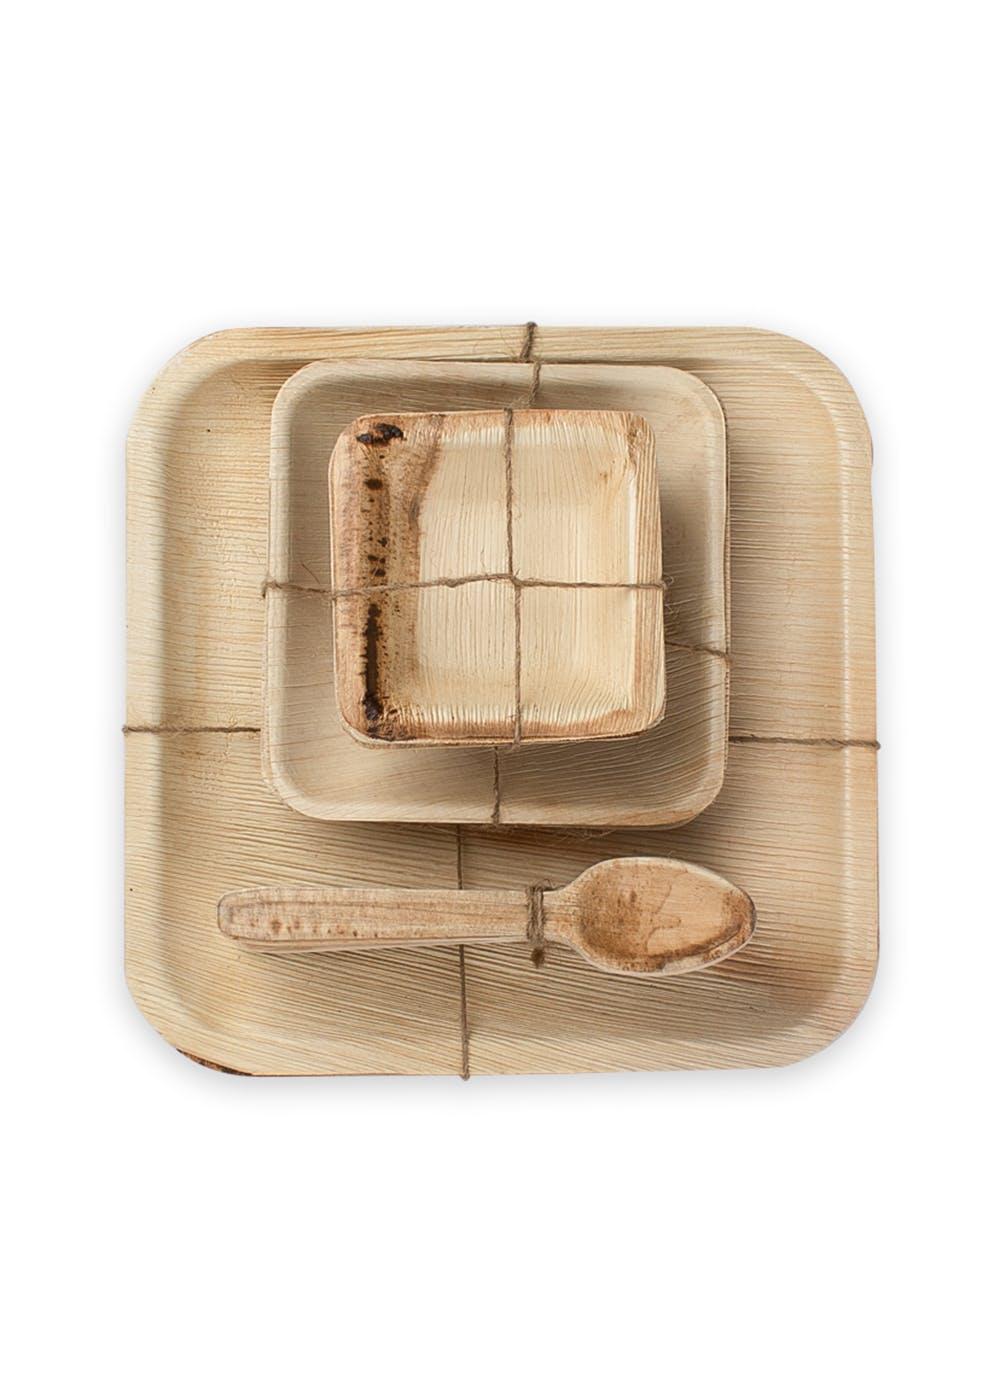 Assorted Leaf Tableware Set For 10 People